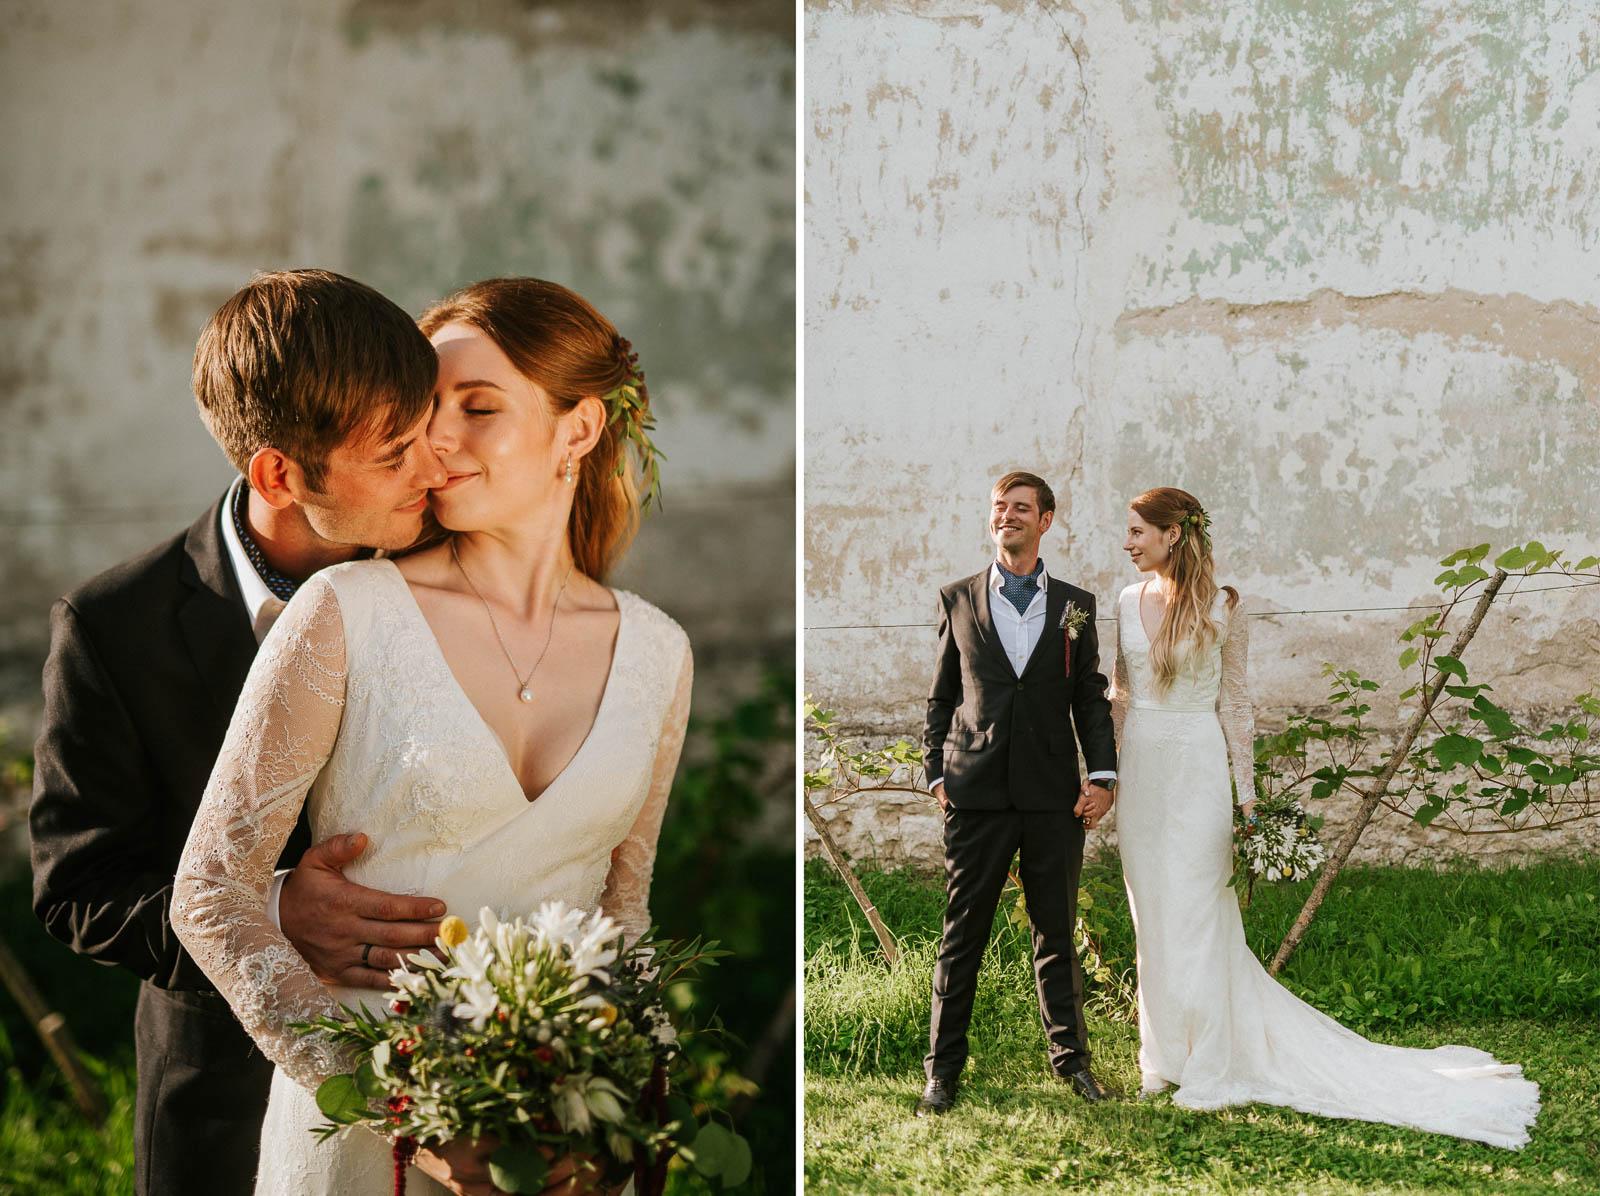 Pohjaka_mois_manor_pulm_wedding_Mait_Juriado-29